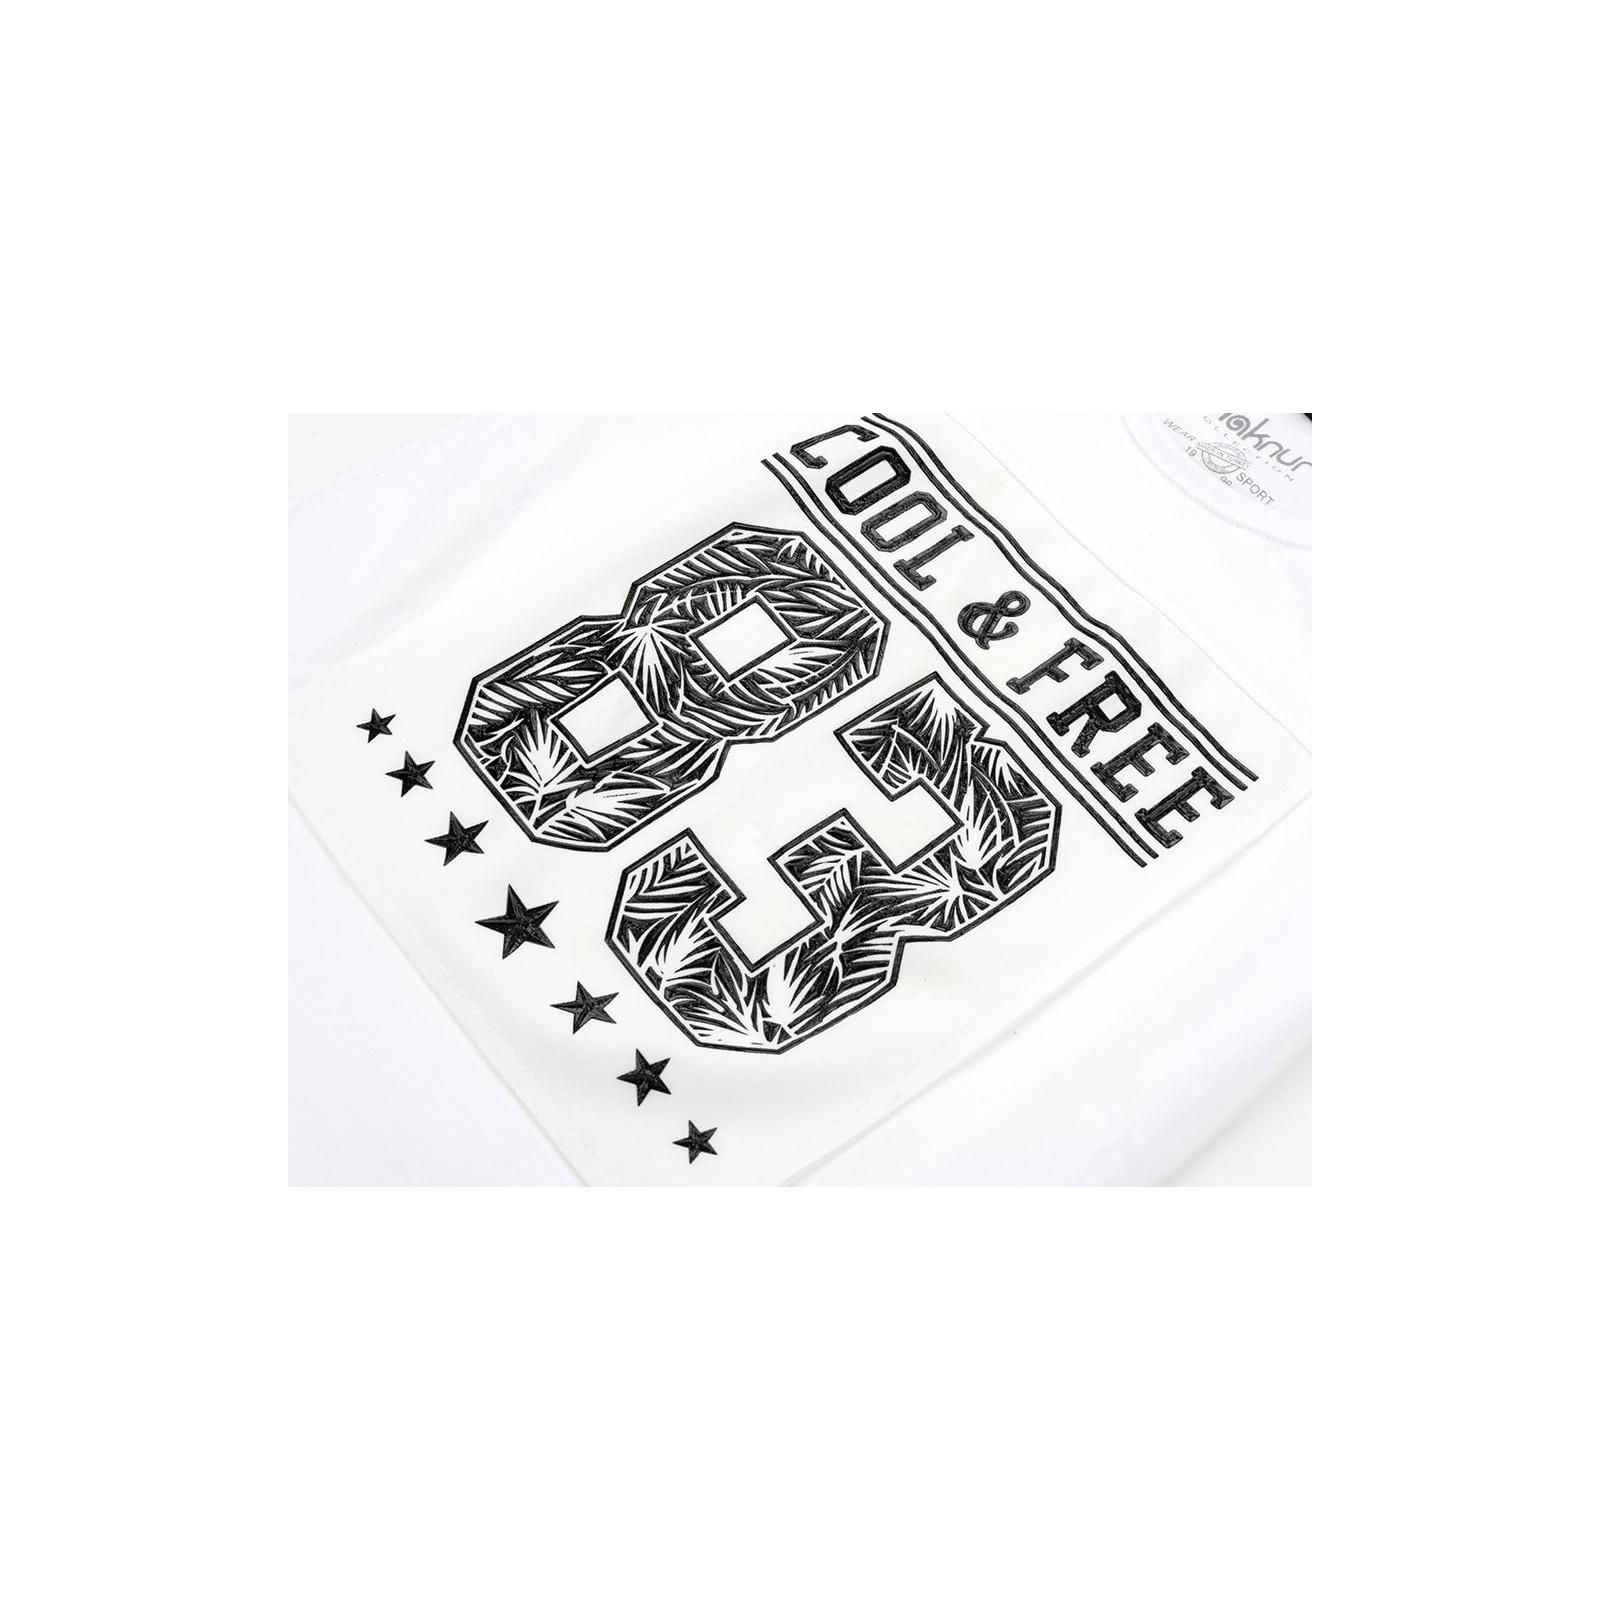 "Футболка детская Haknur ""COOL & FREE"" (6547-146B-white) изображение 4"